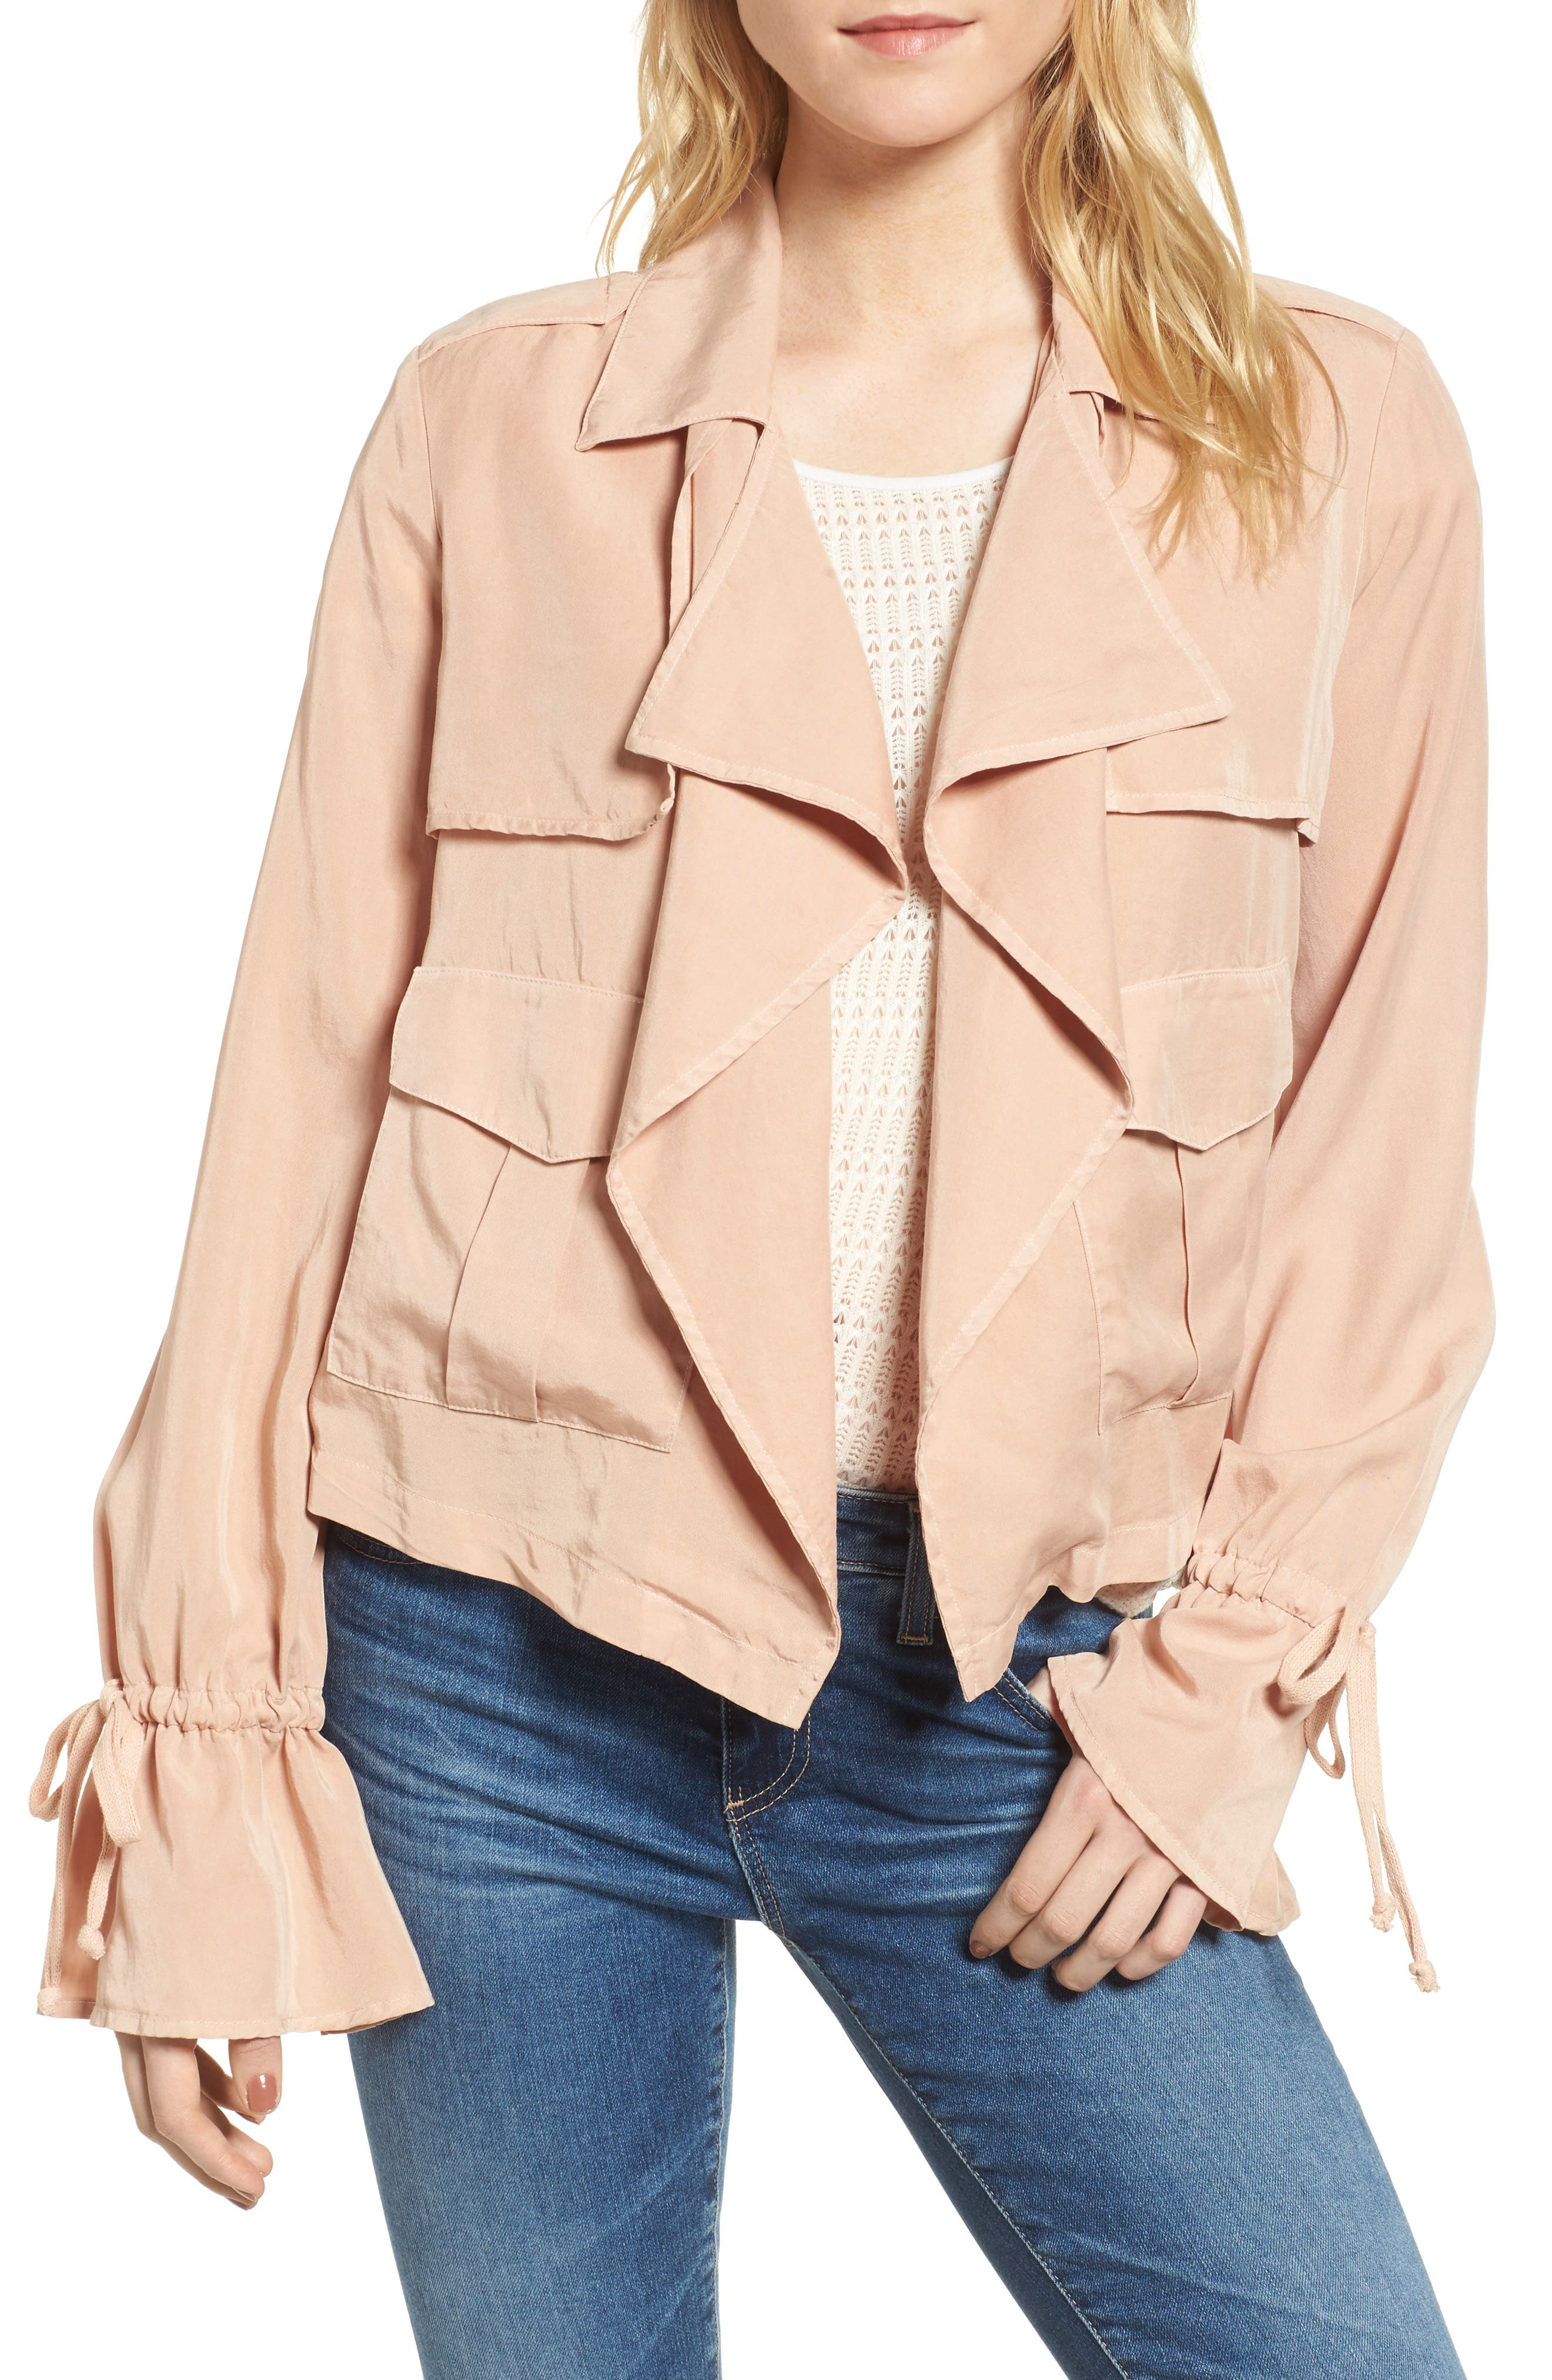 Ella Moss Open Front Jacket